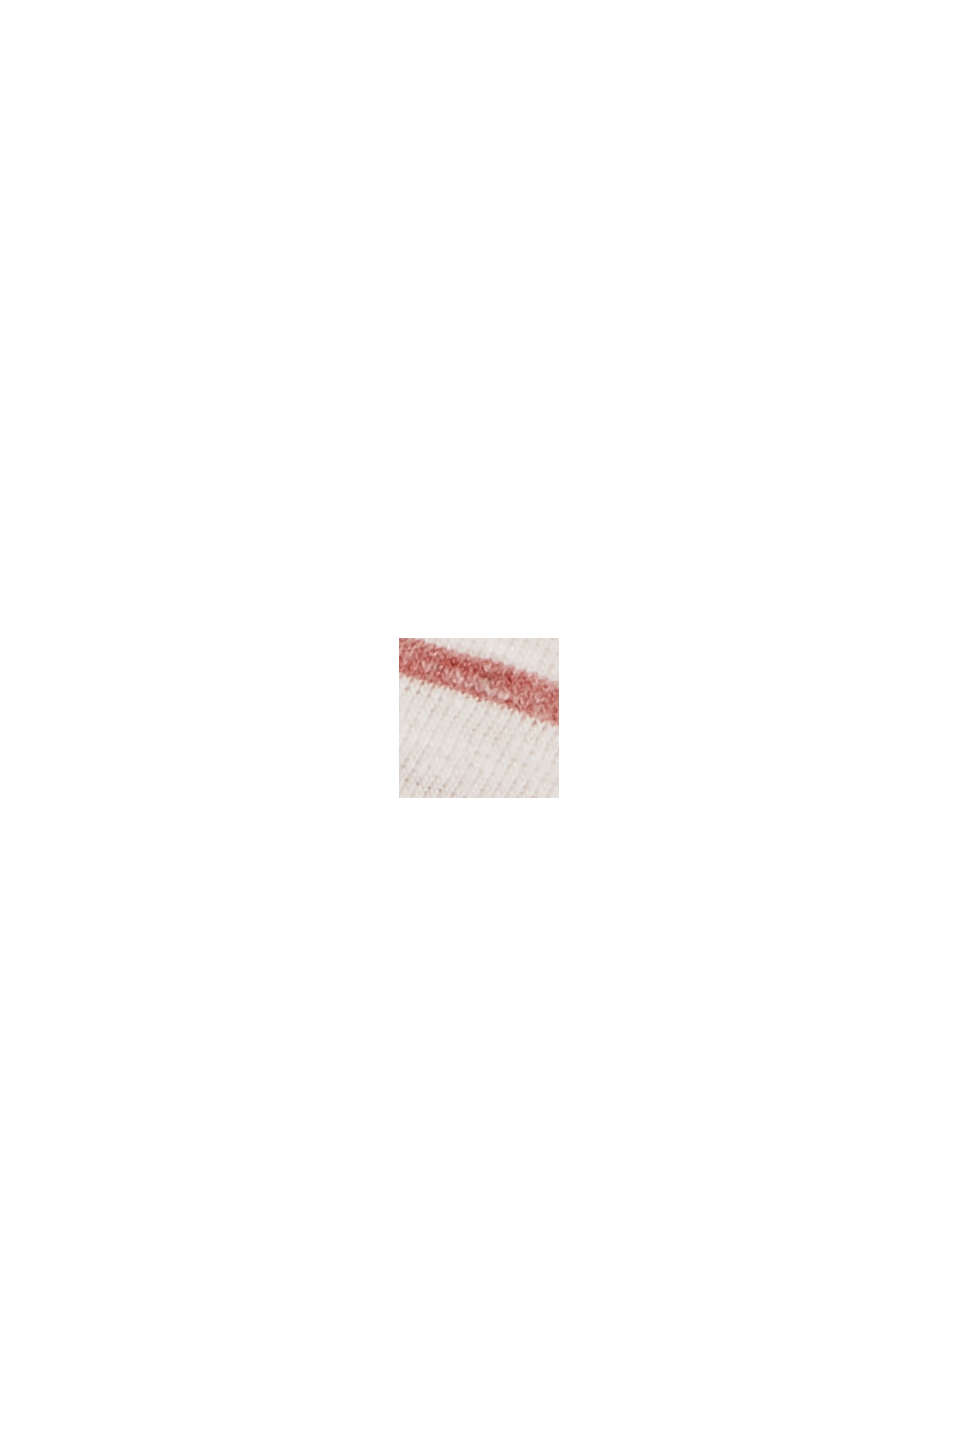 CURVY Recycelt: Longsleeve mit Streifen, RED, swatch